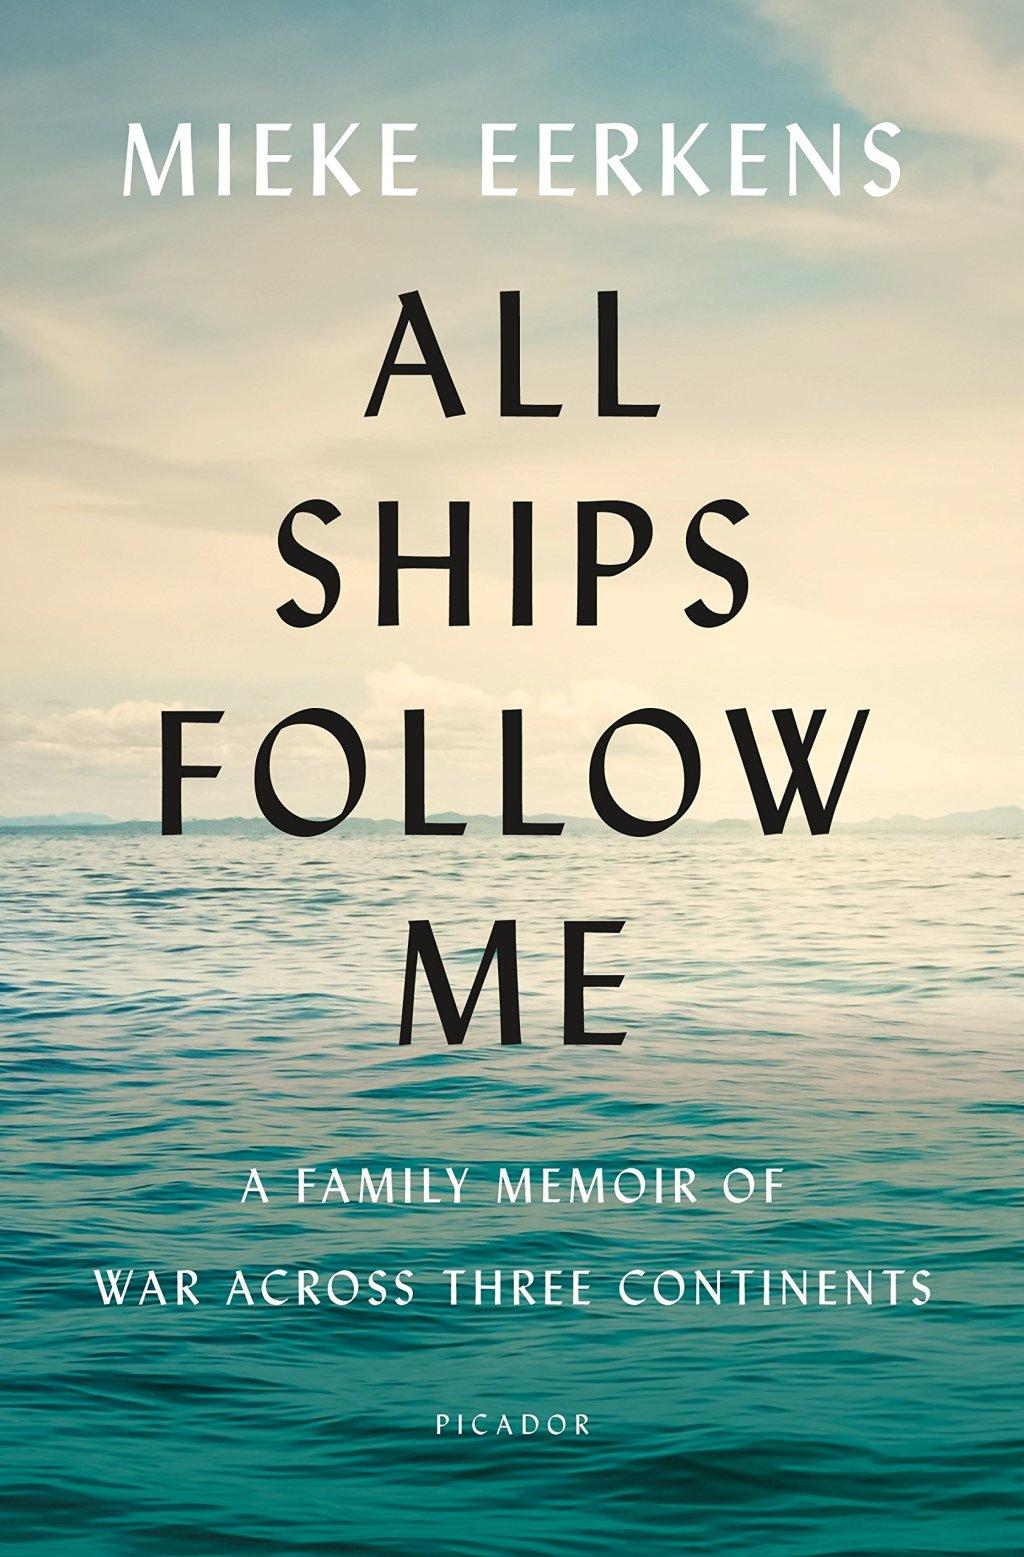 All Ships Follow Me: A Family Memoir of War Across Three Continents, Mieke Eerkens (Picador, April 2019)